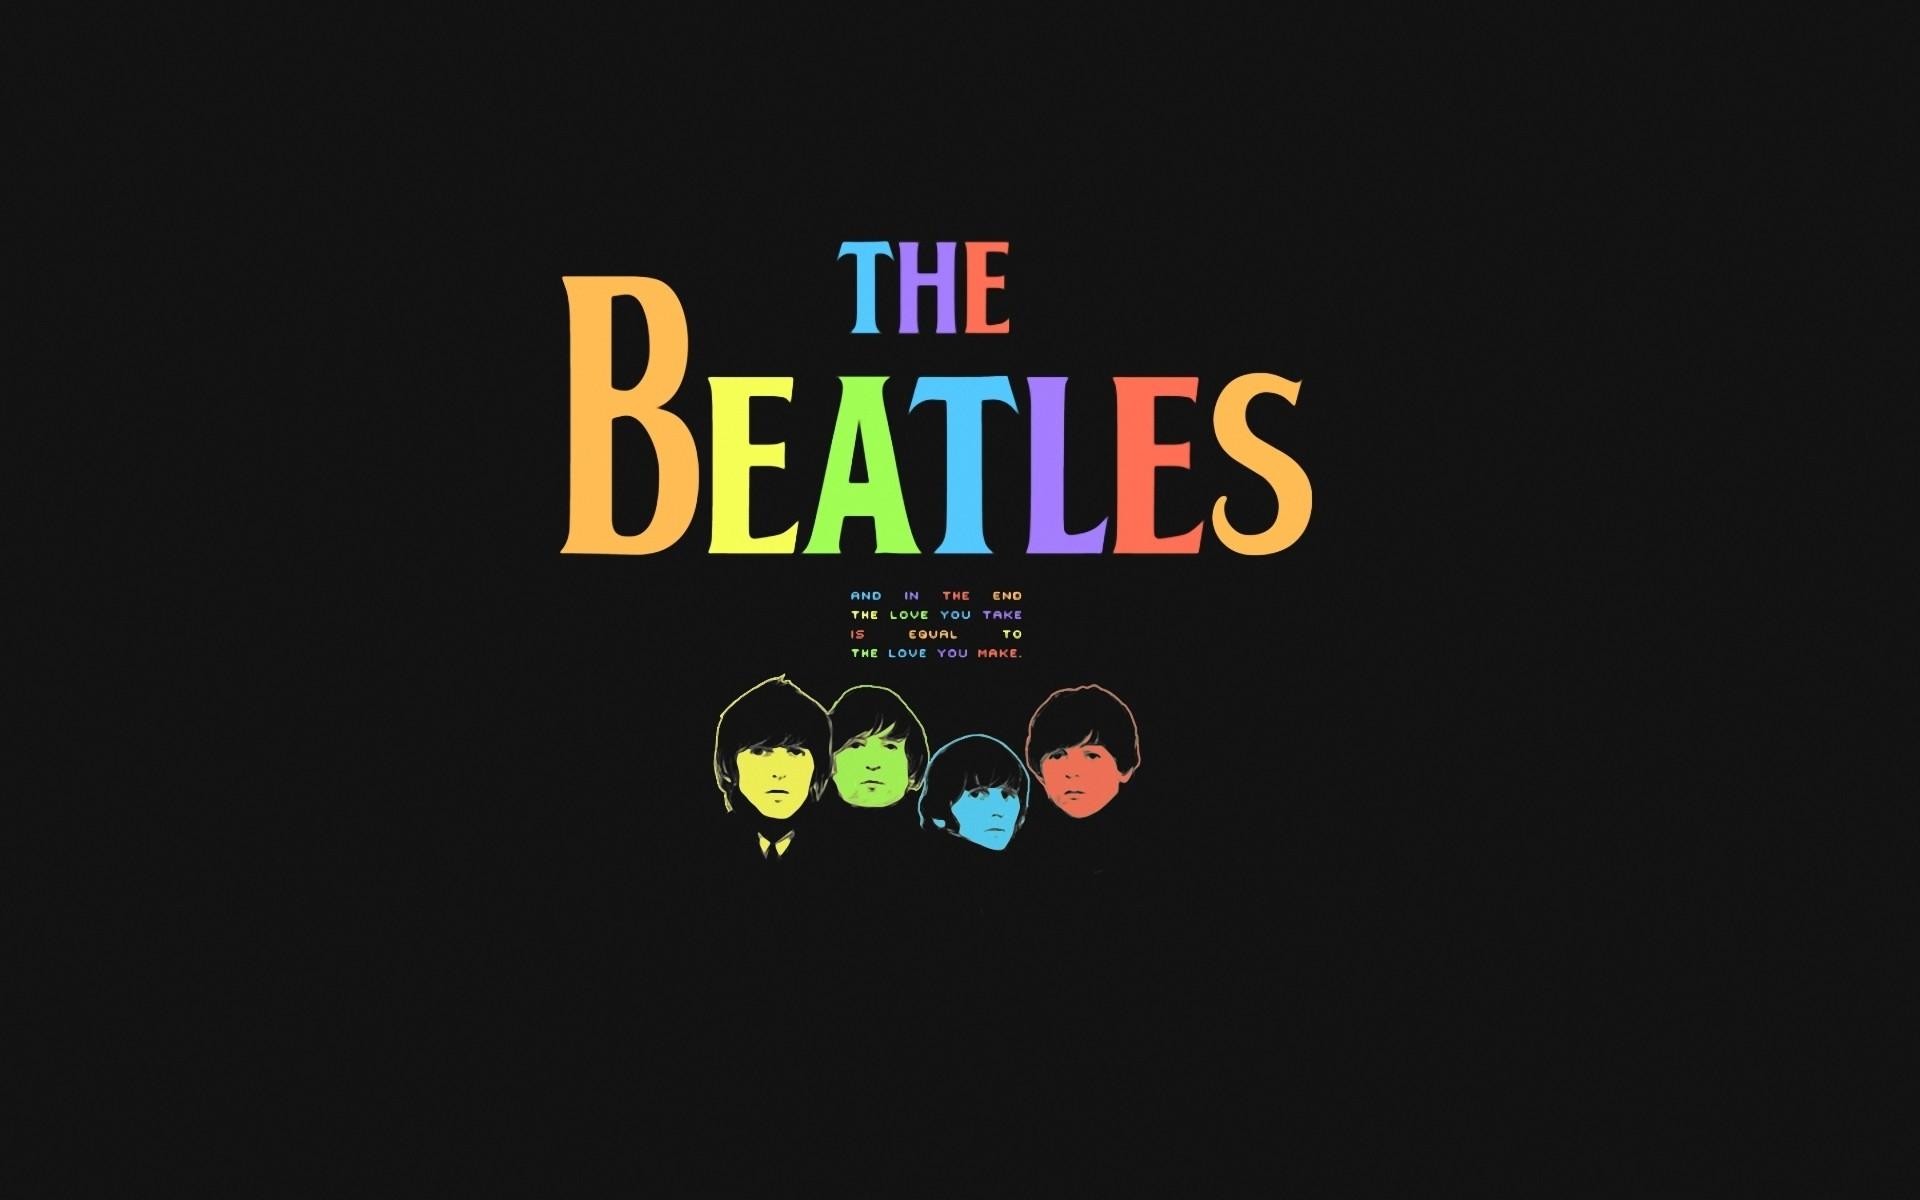 Los Beatles pop art - 1920x1200